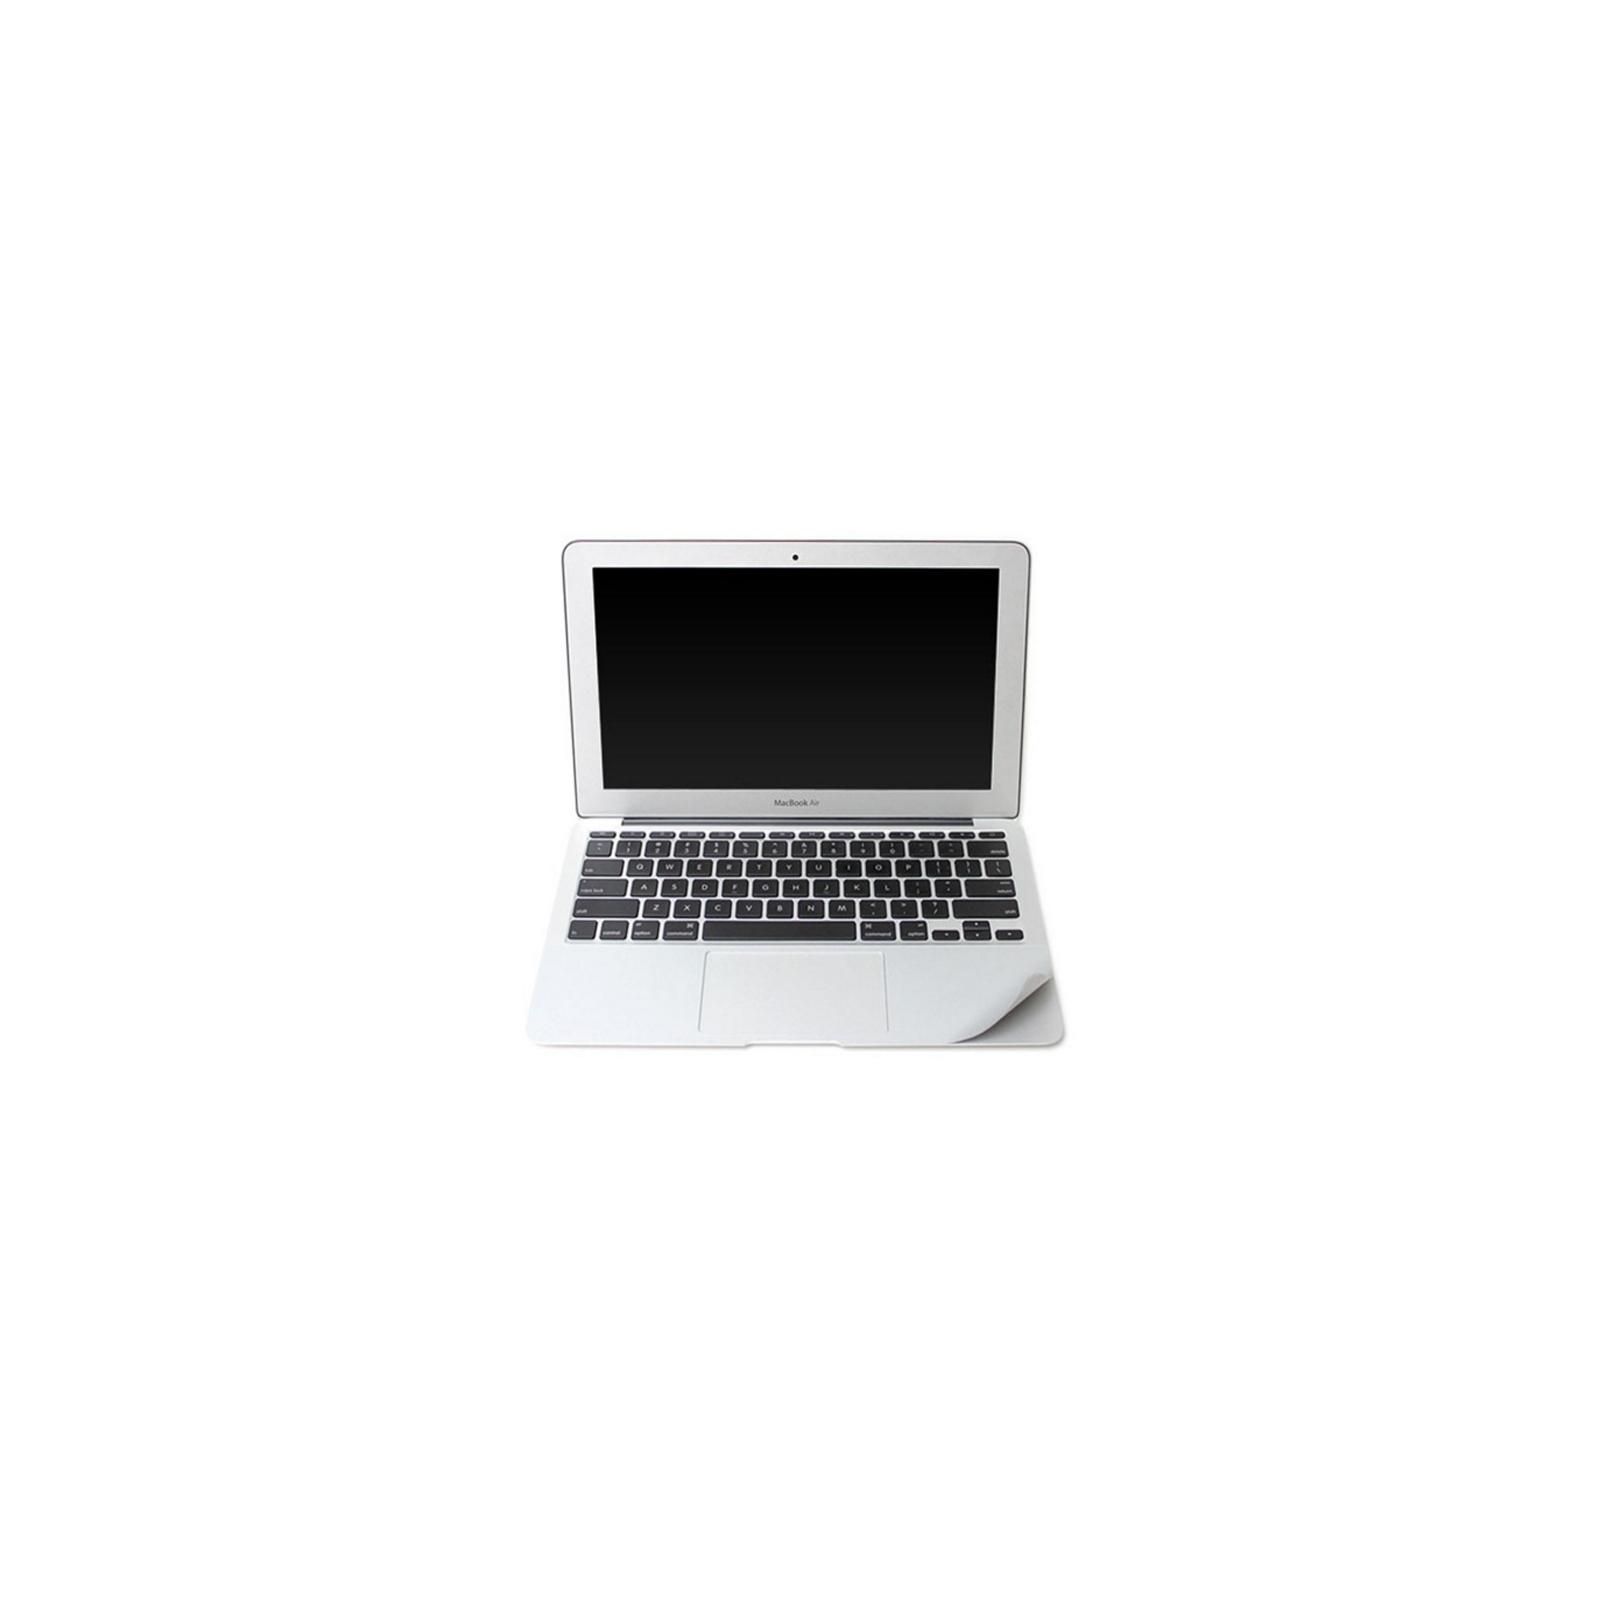 Пленка защитная JCPAL WristGuard Palm Guard для MacBook Air 11 (JCP2018) изображение 4